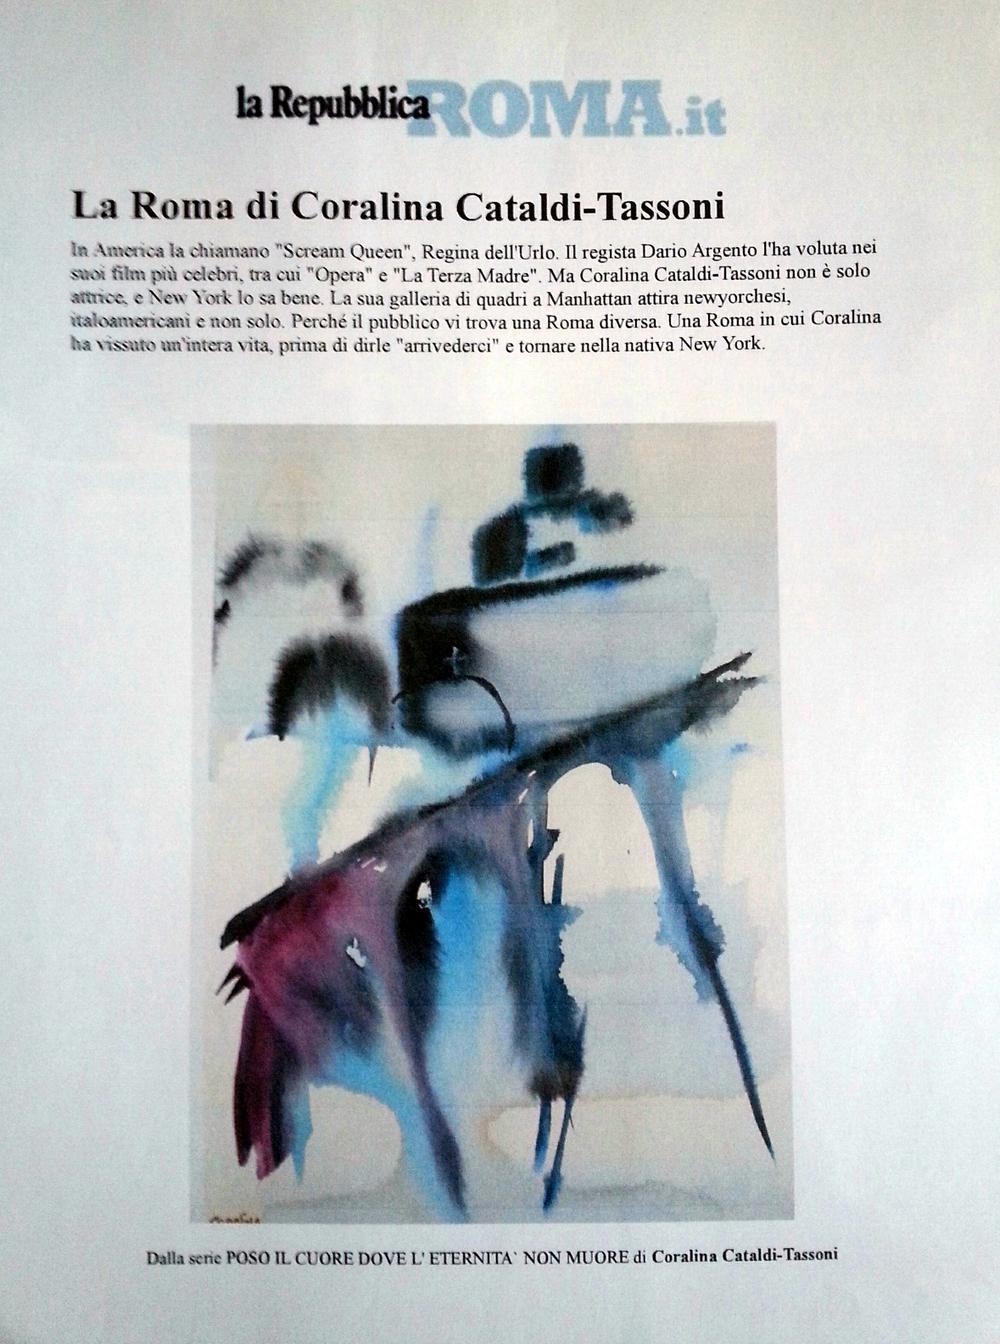 Interview with Coralina Cataldi-Tassoni (2).jpg